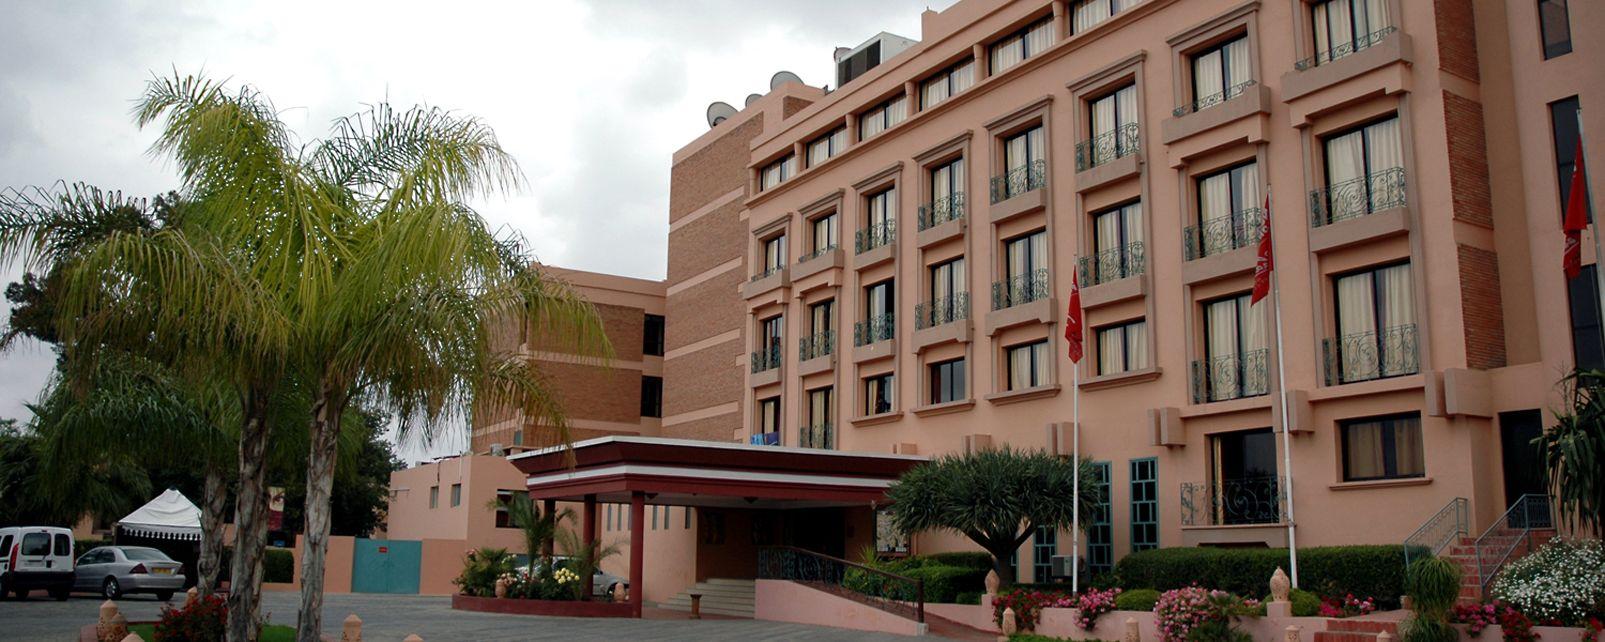 Hôtel  Les Almoravides